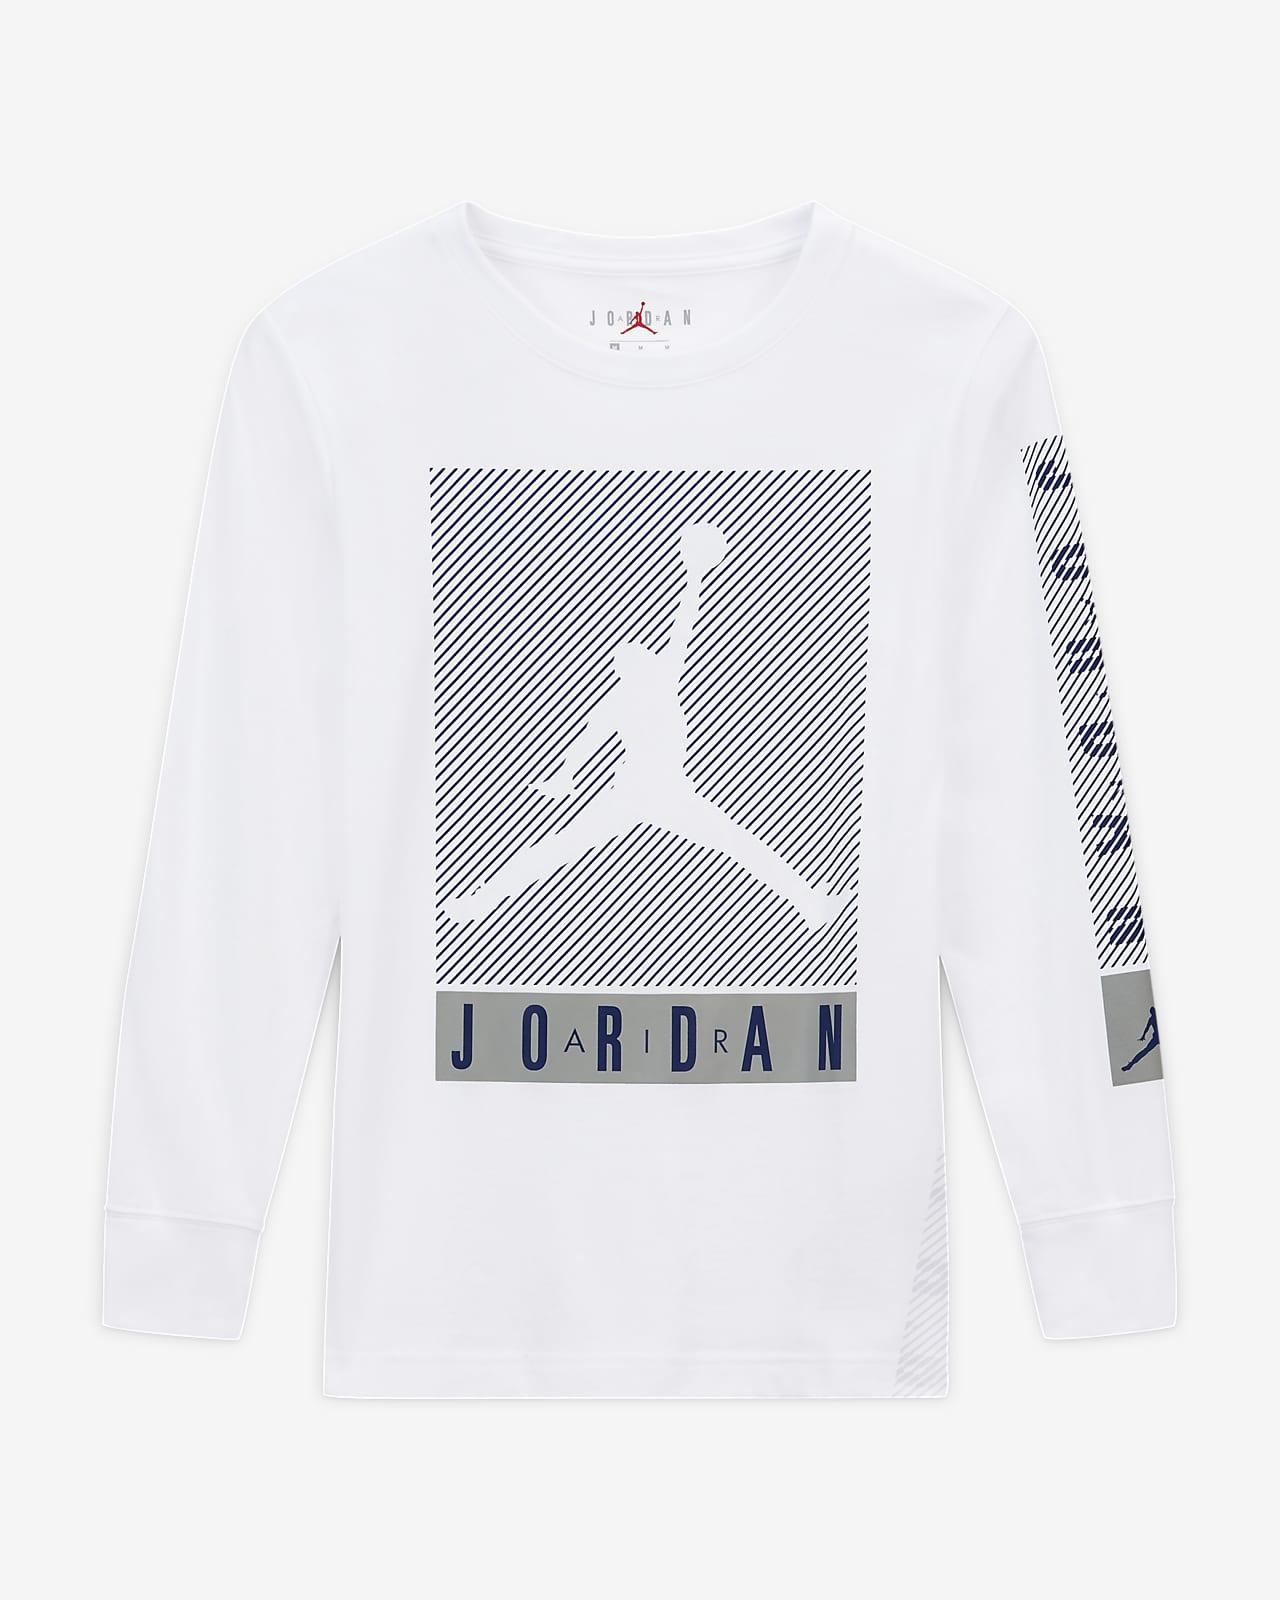 Jordan Big Kids' (Boys') Long-Sleeve T-Shirt